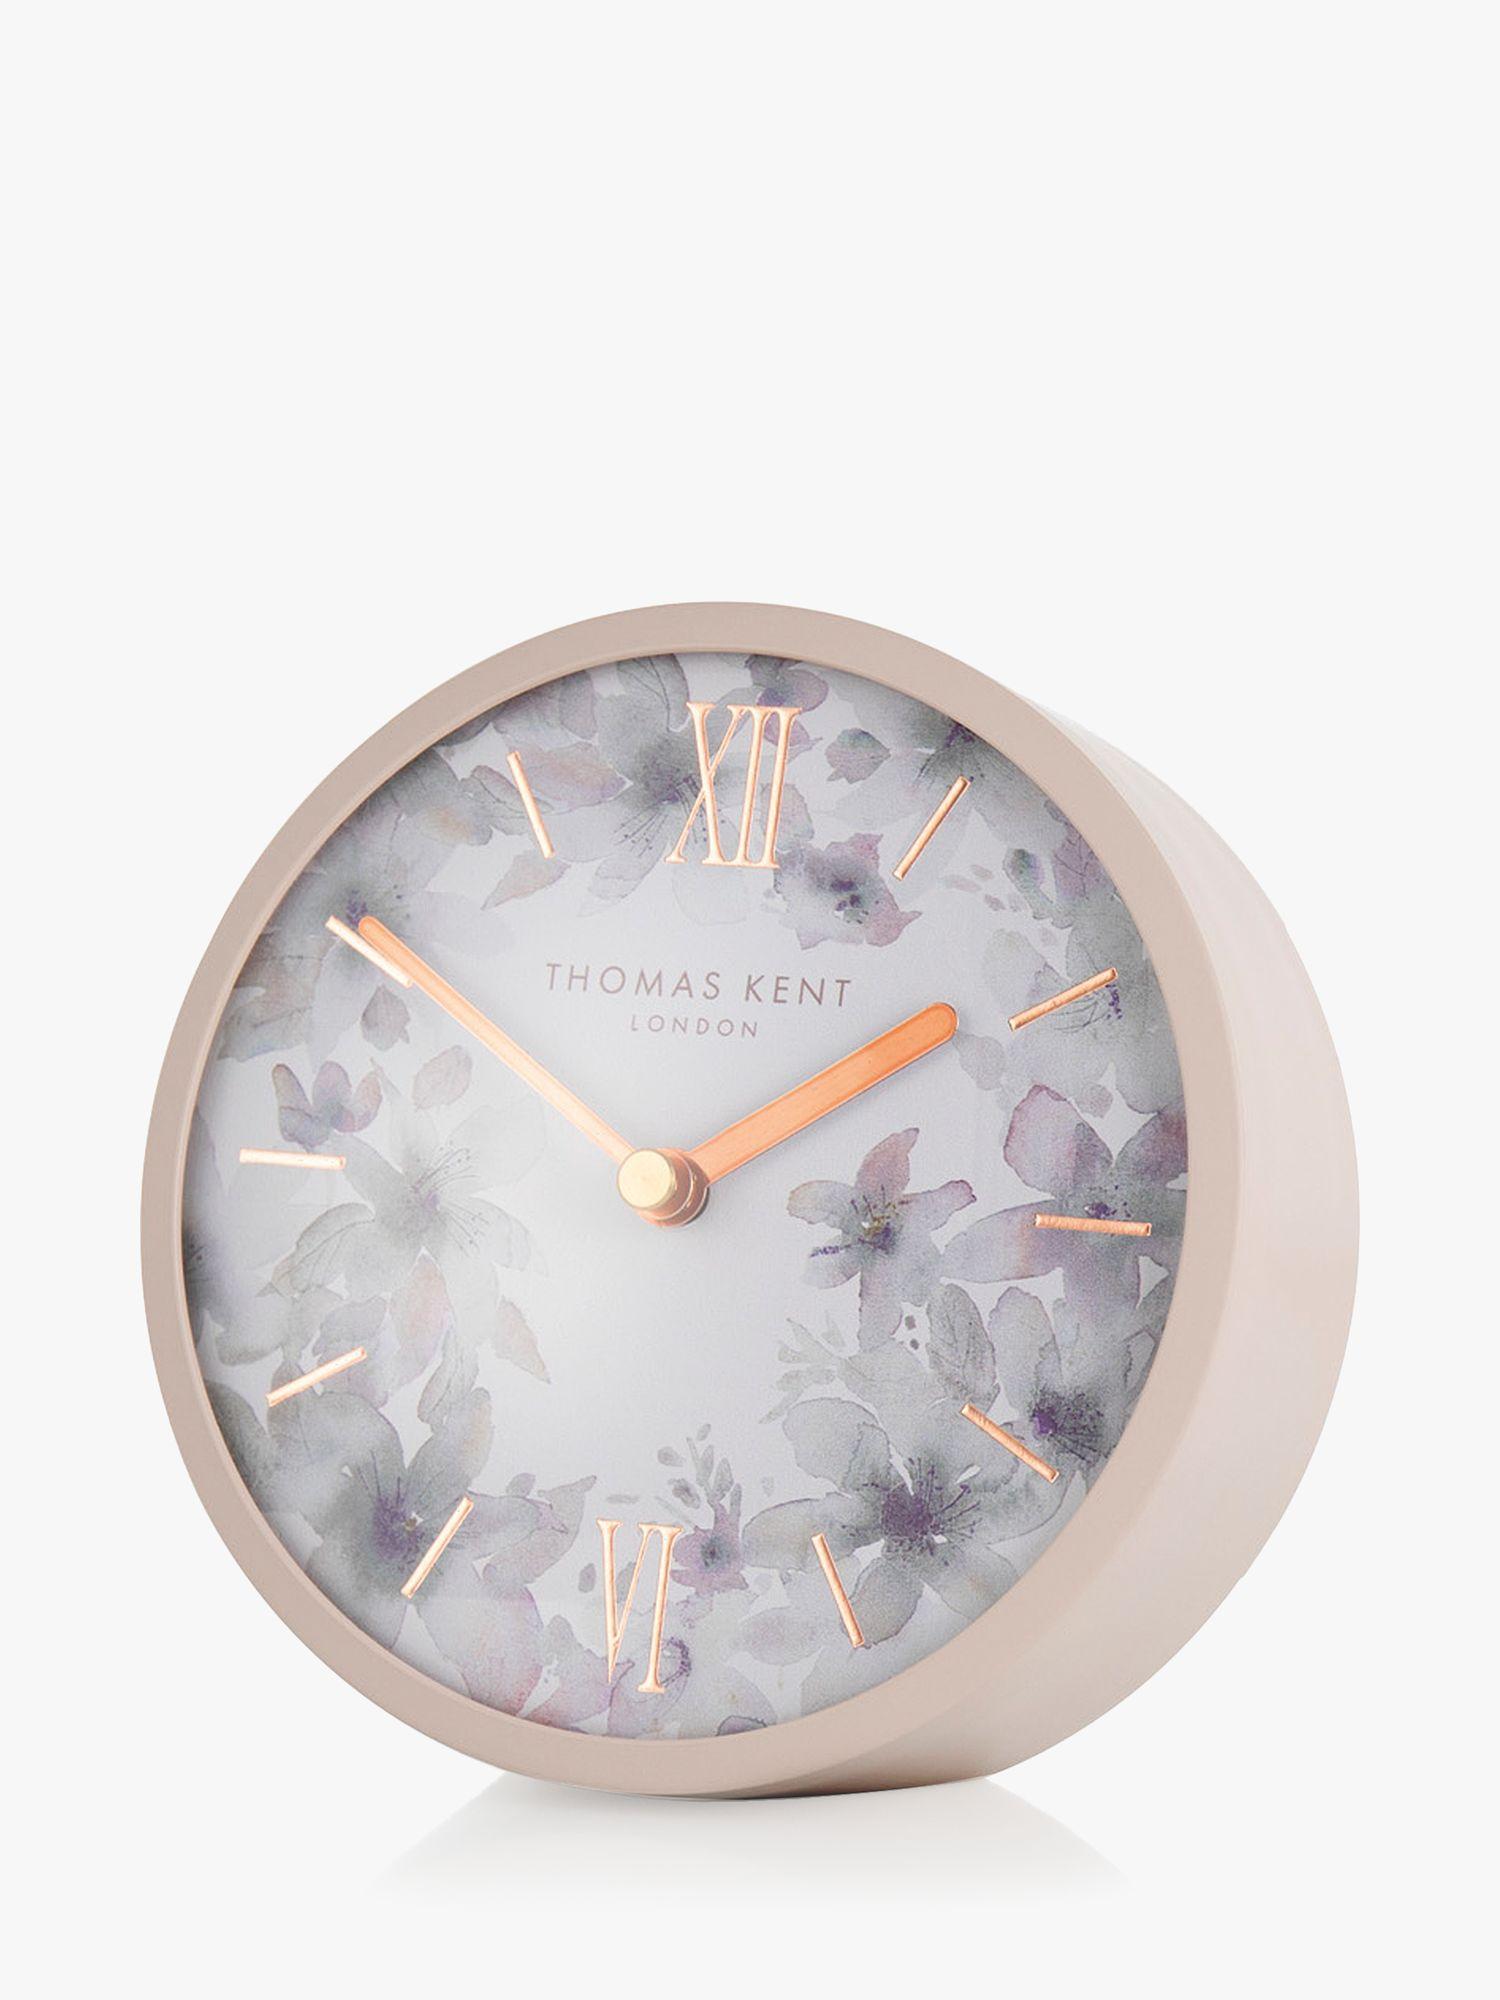 Thomas Kent Mini Crofter Flower Analogue Mantel Clock, Dusty Pink